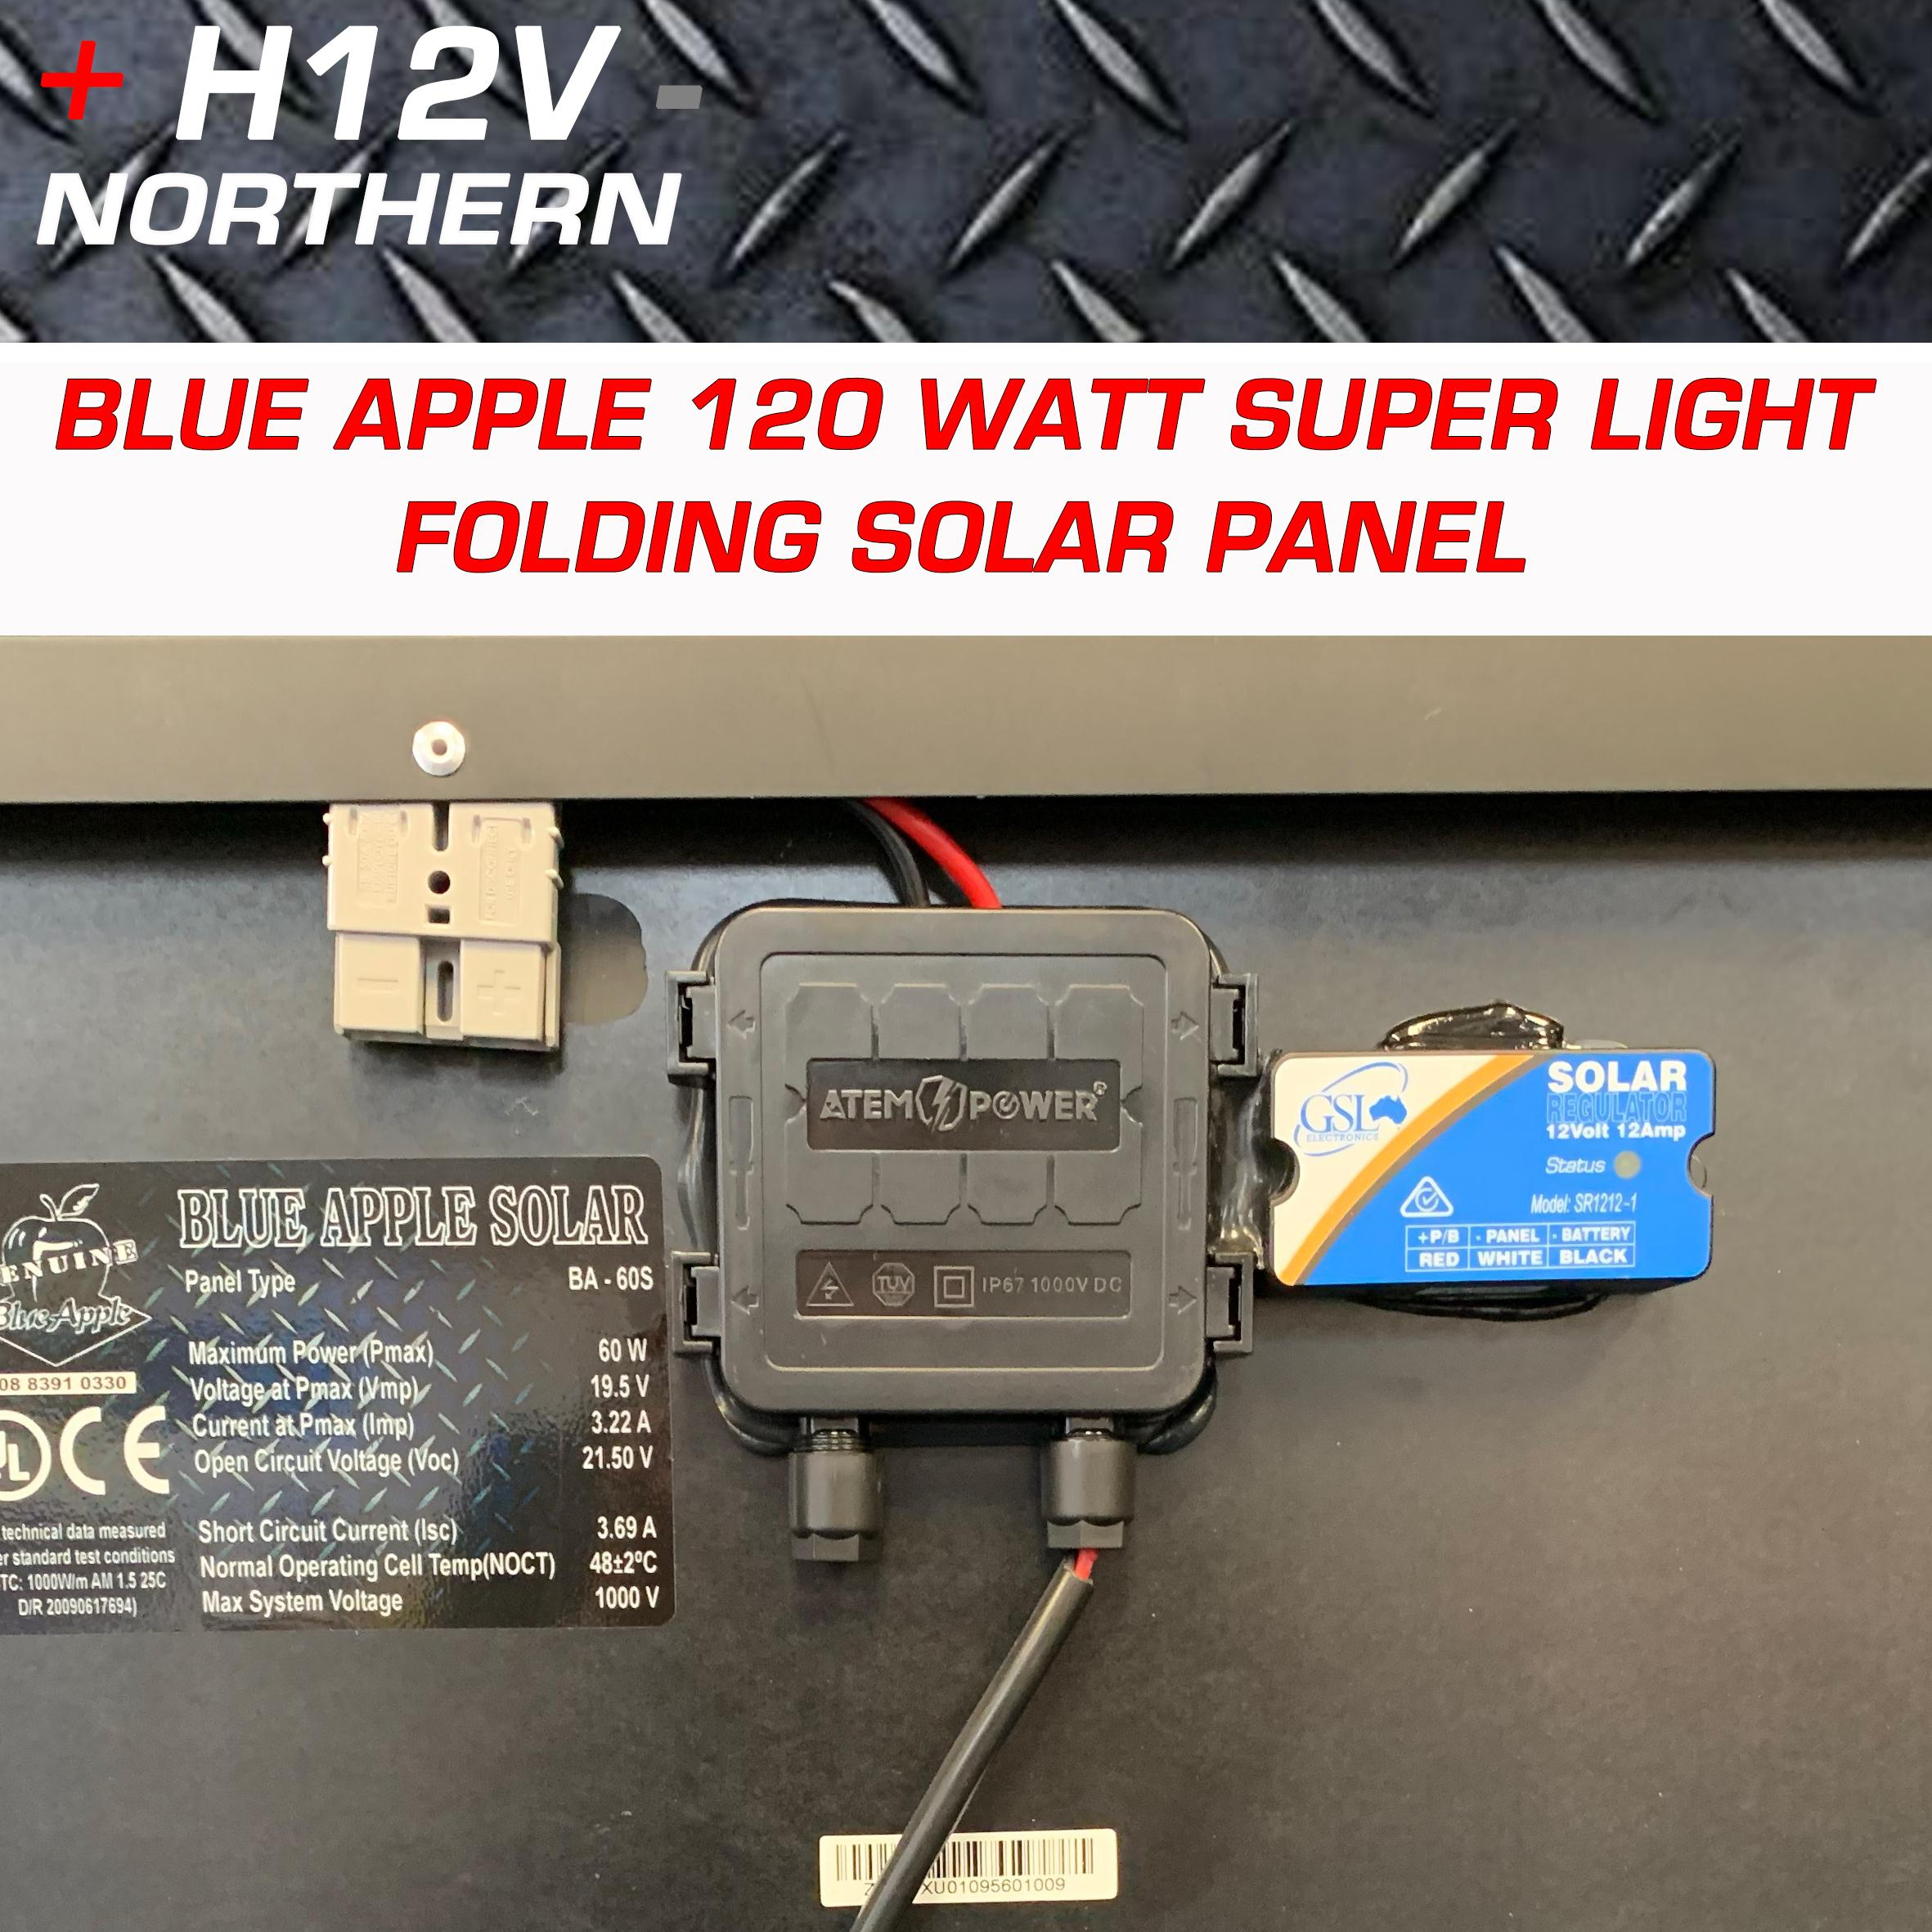 Blue Apple 120 Watt Super Thin Portable Split Fold Panel